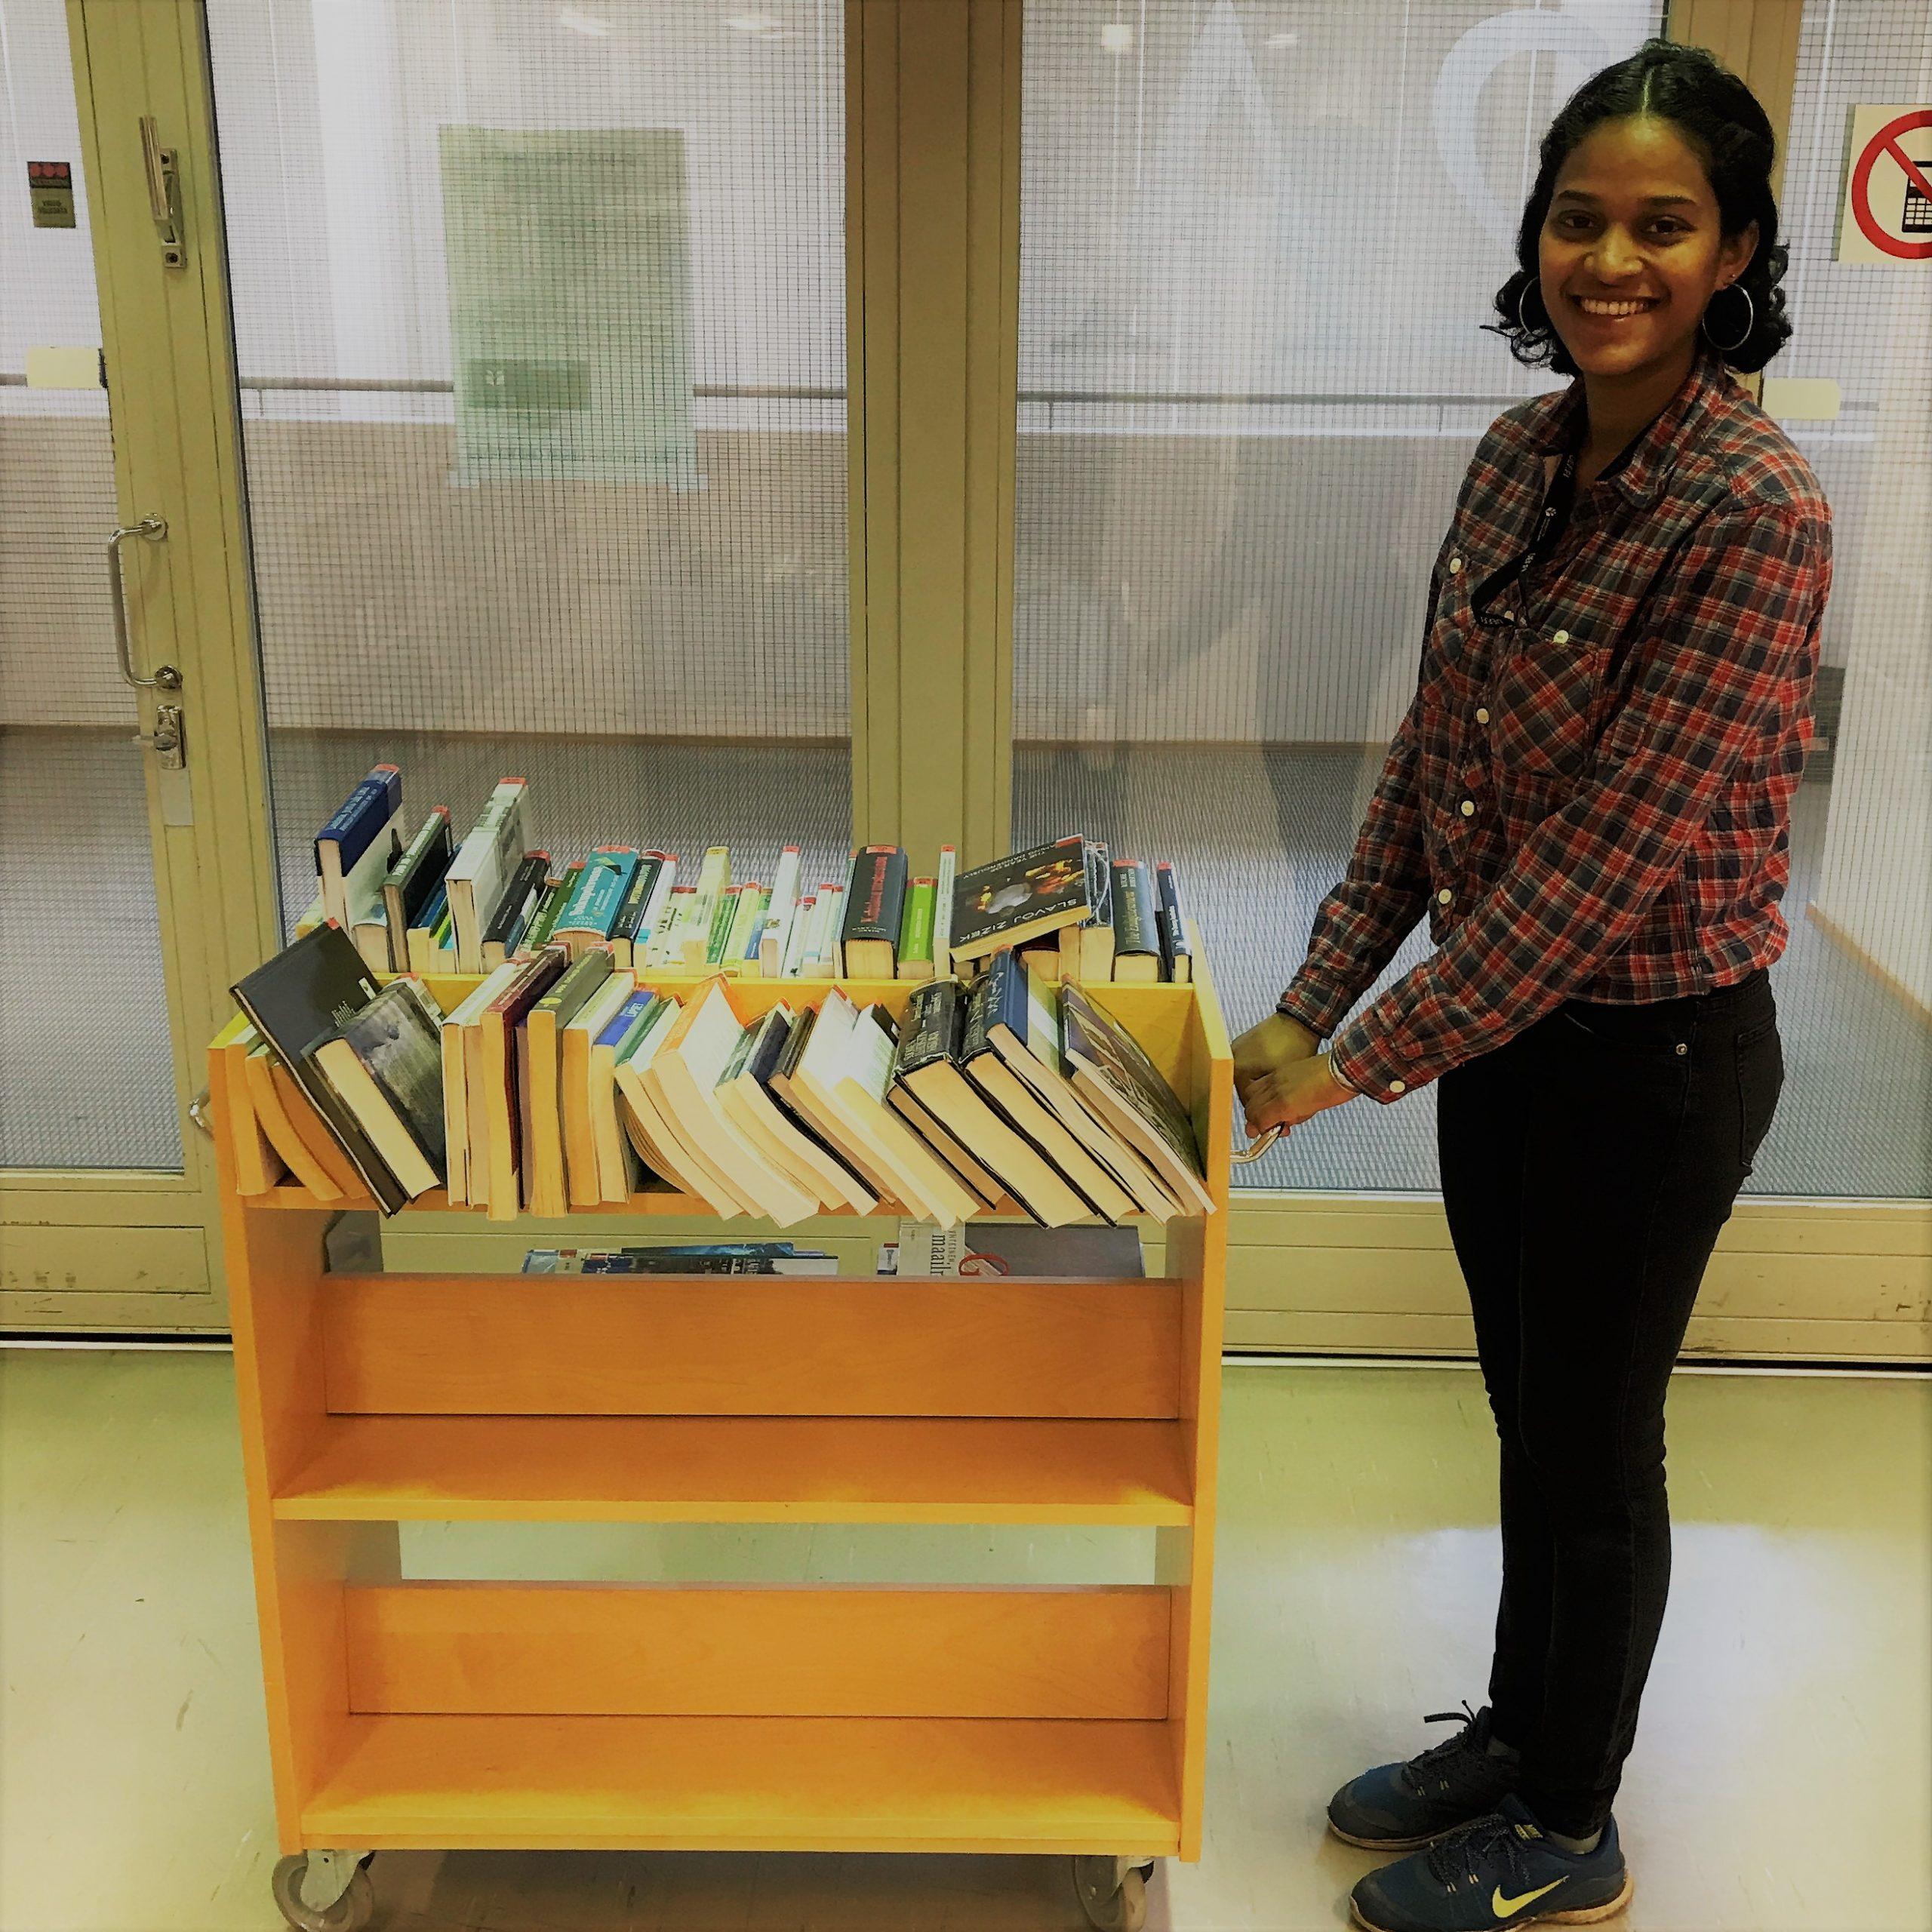 Kirjakärry jossa kirjoja, nuori nainen. Book trolley and a young woman.